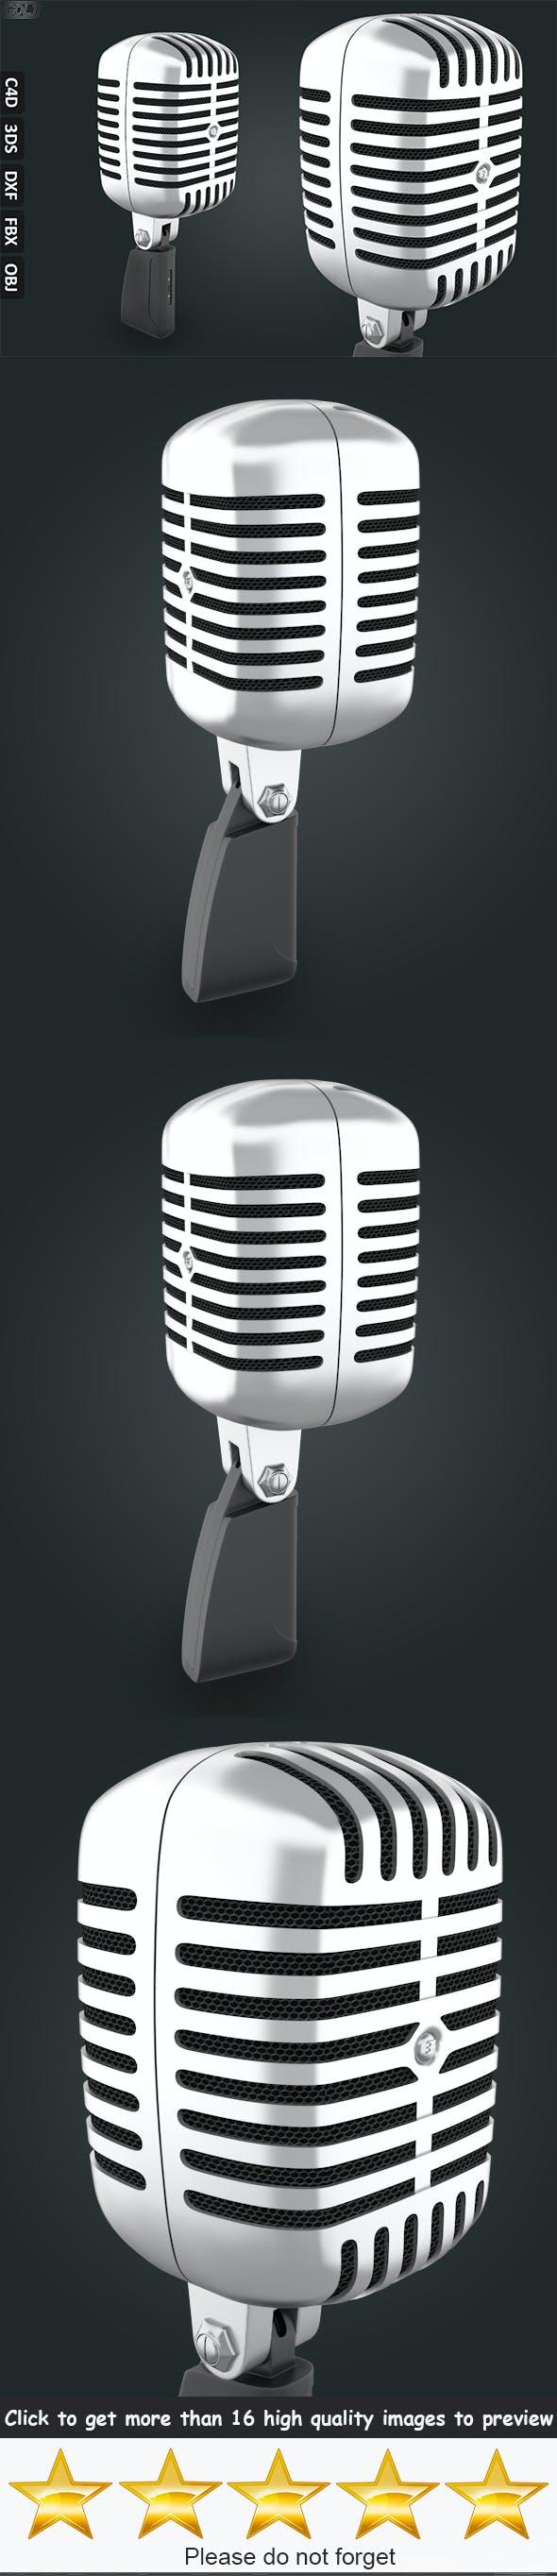 Microphone 1955 Vintage - 3DOcean Item for Sale